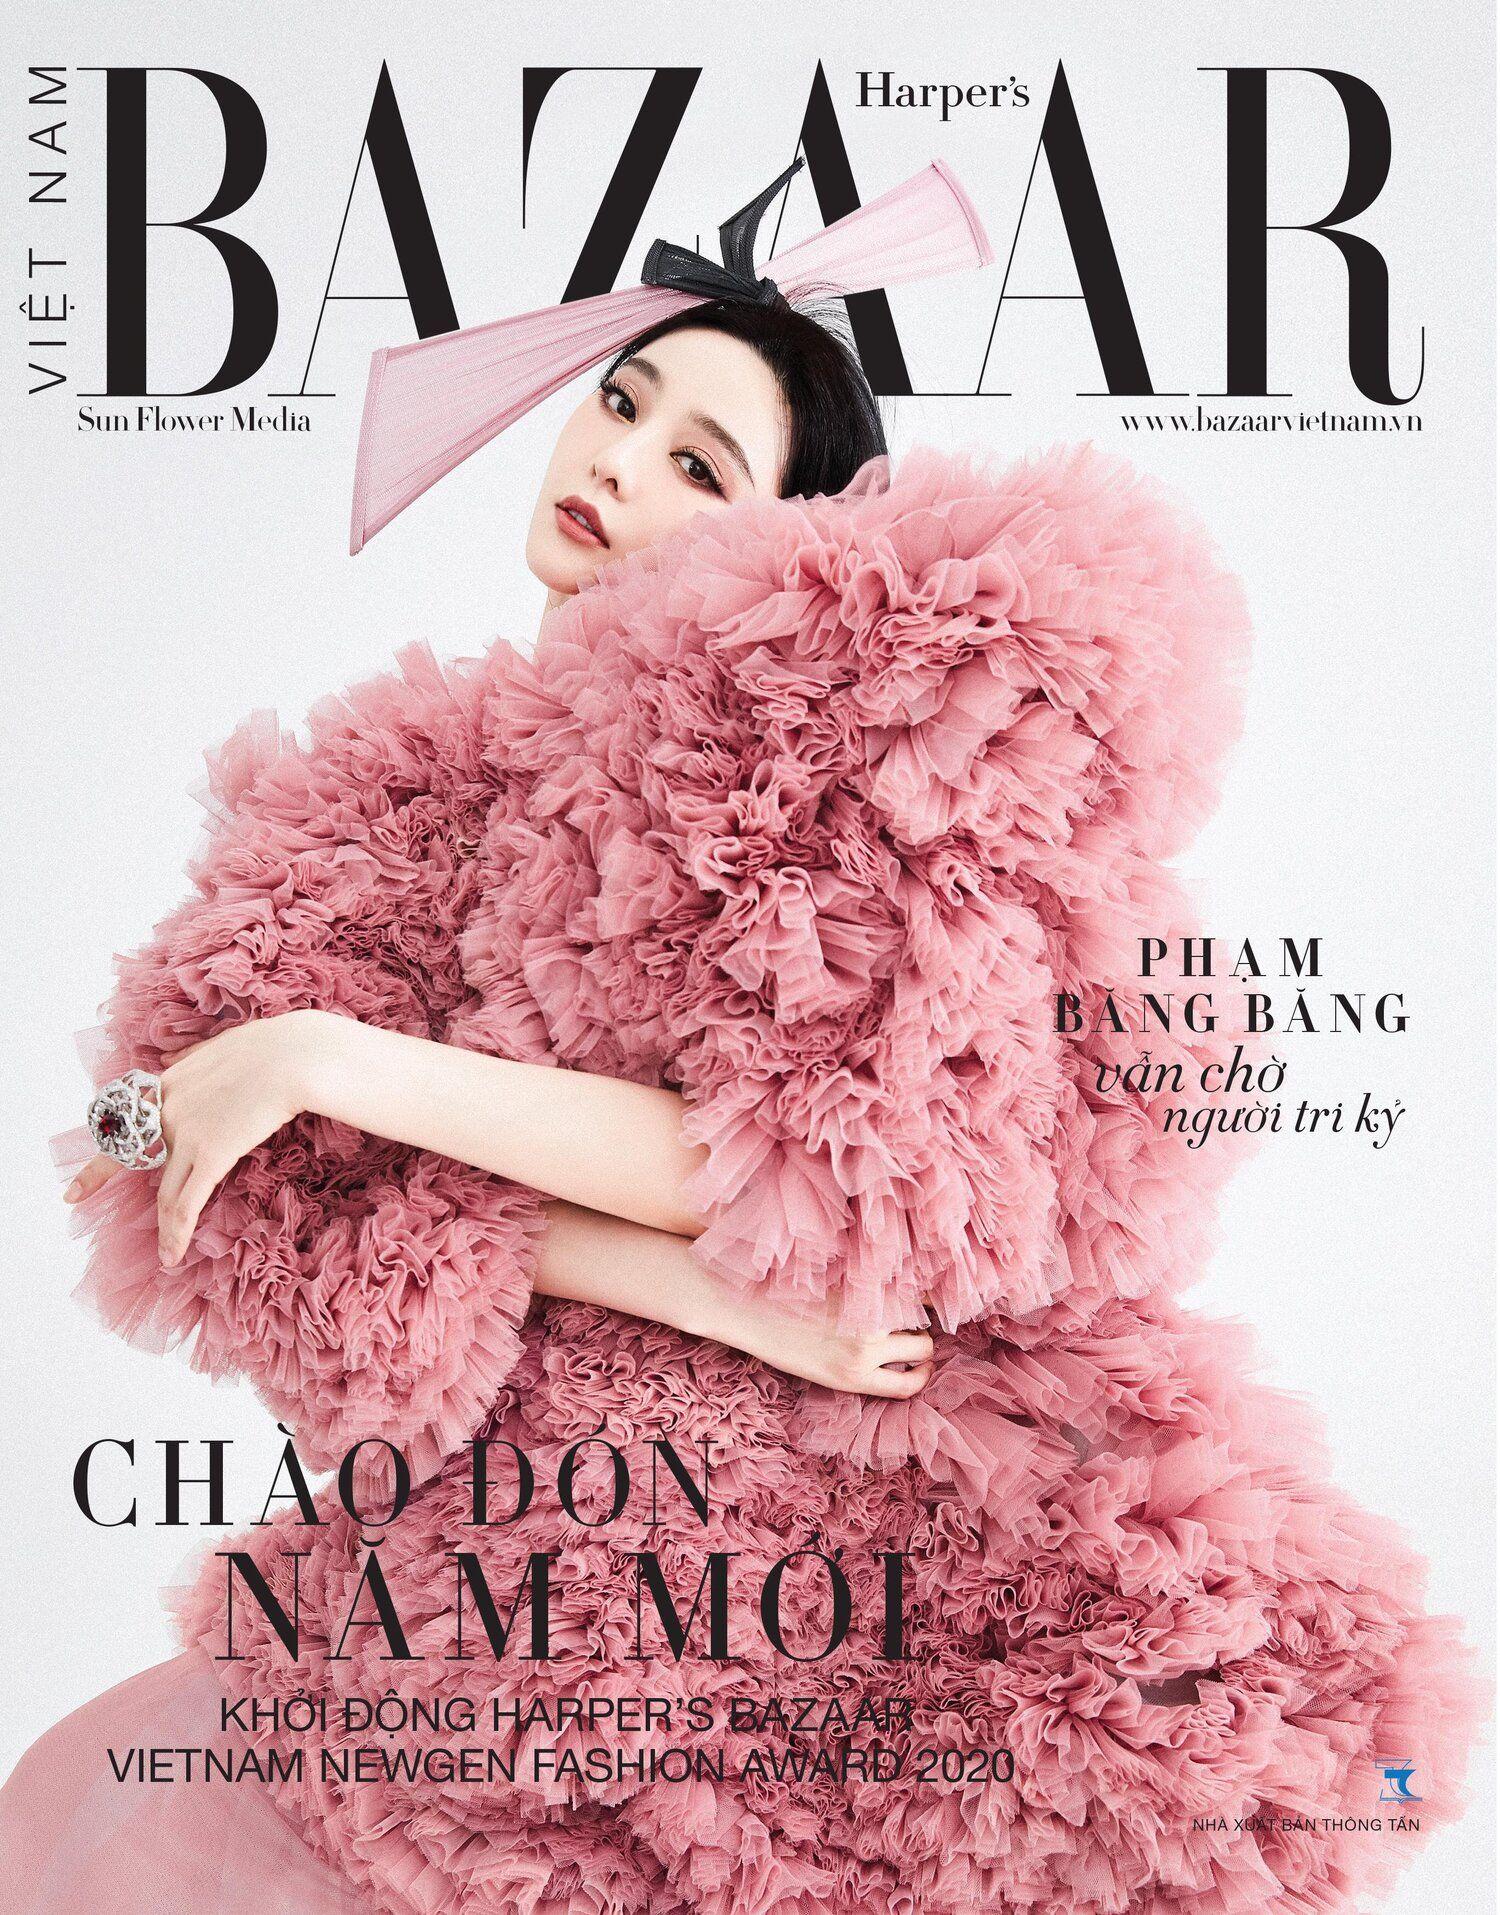 , Fan Bingbing Returns, Covers Harper's Bazaar Vietnam January 2020 — Anne of Carversville, Anja Rubik Blog, Anja Rubik Blog